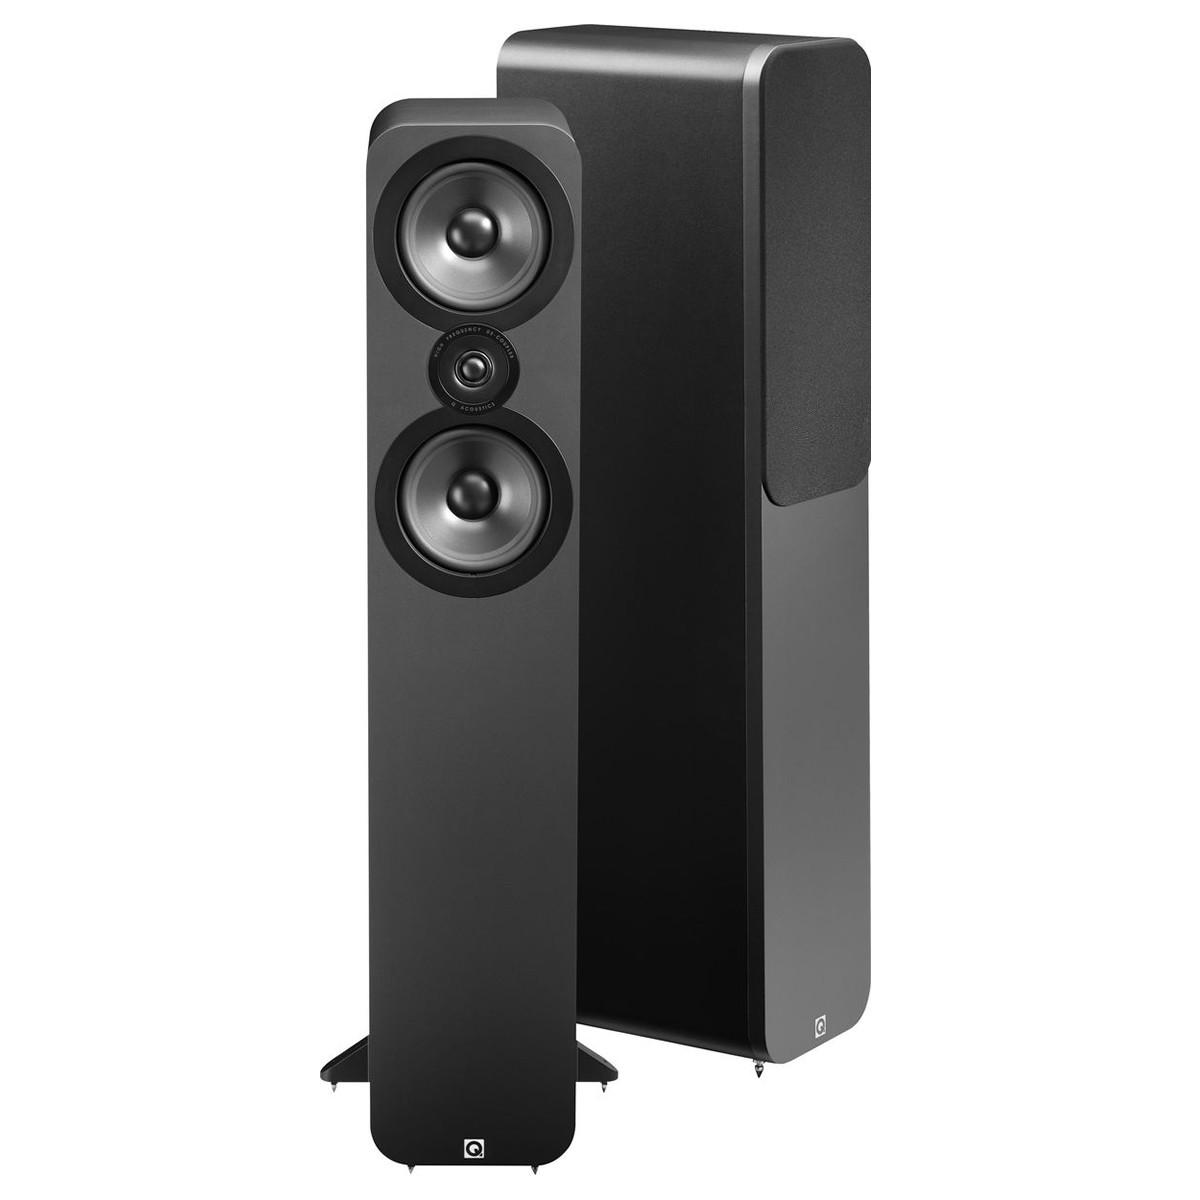 Q Accoustics 3050 floor speakers have great sound